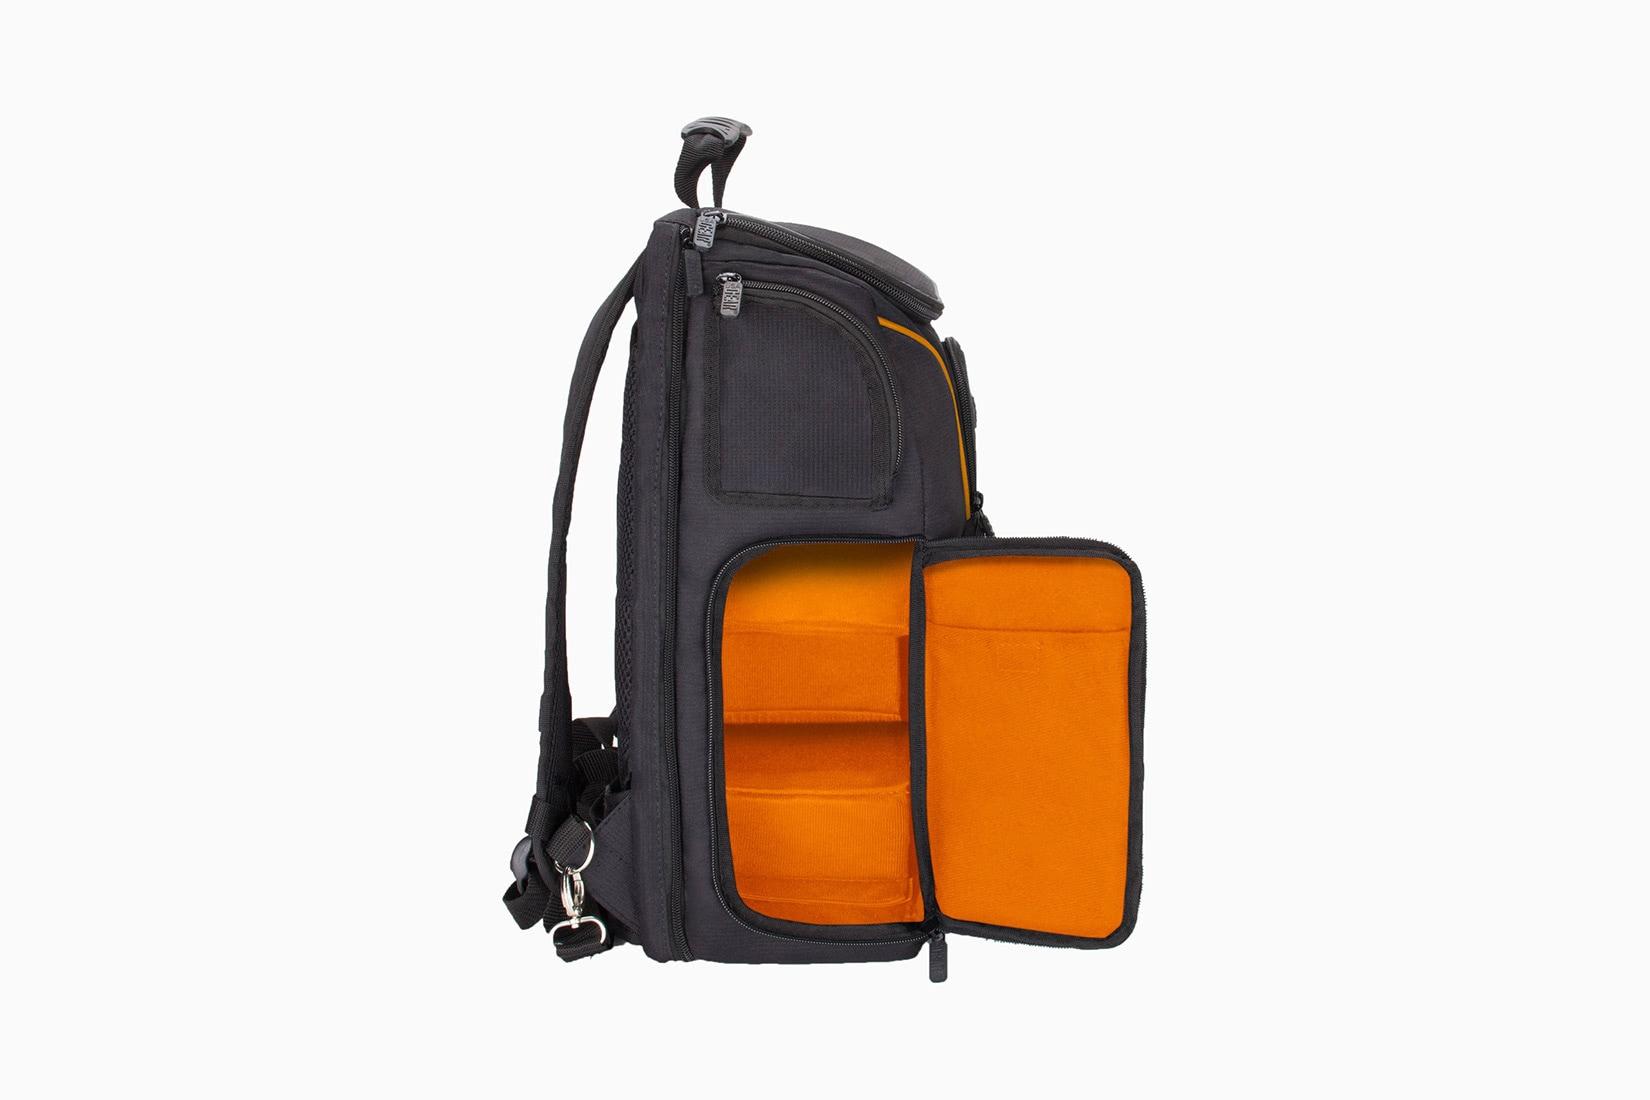 best camera backpacks usa gear - Luxe Digital